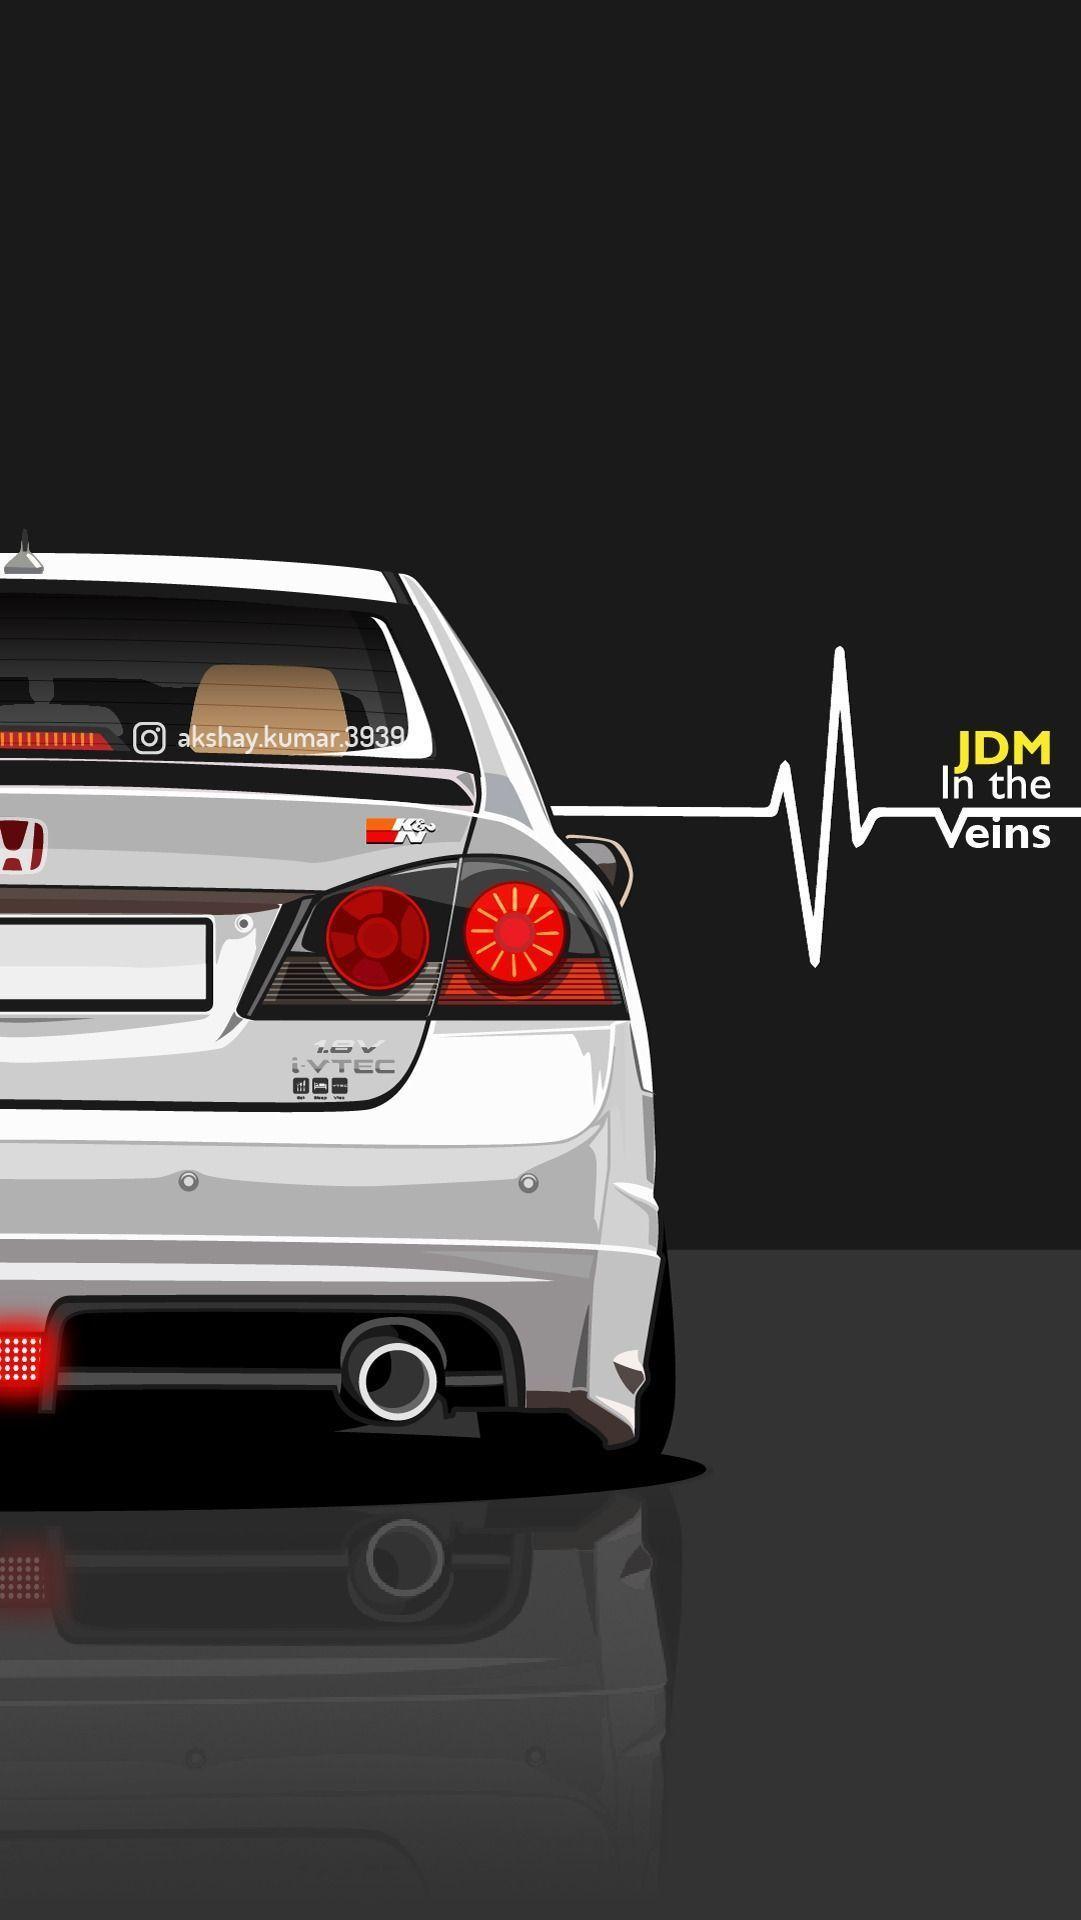 Honda Civic Fd2 Wallpapers Top Free Honda Civic Fd2 Backgrounds Wallpaperaccess